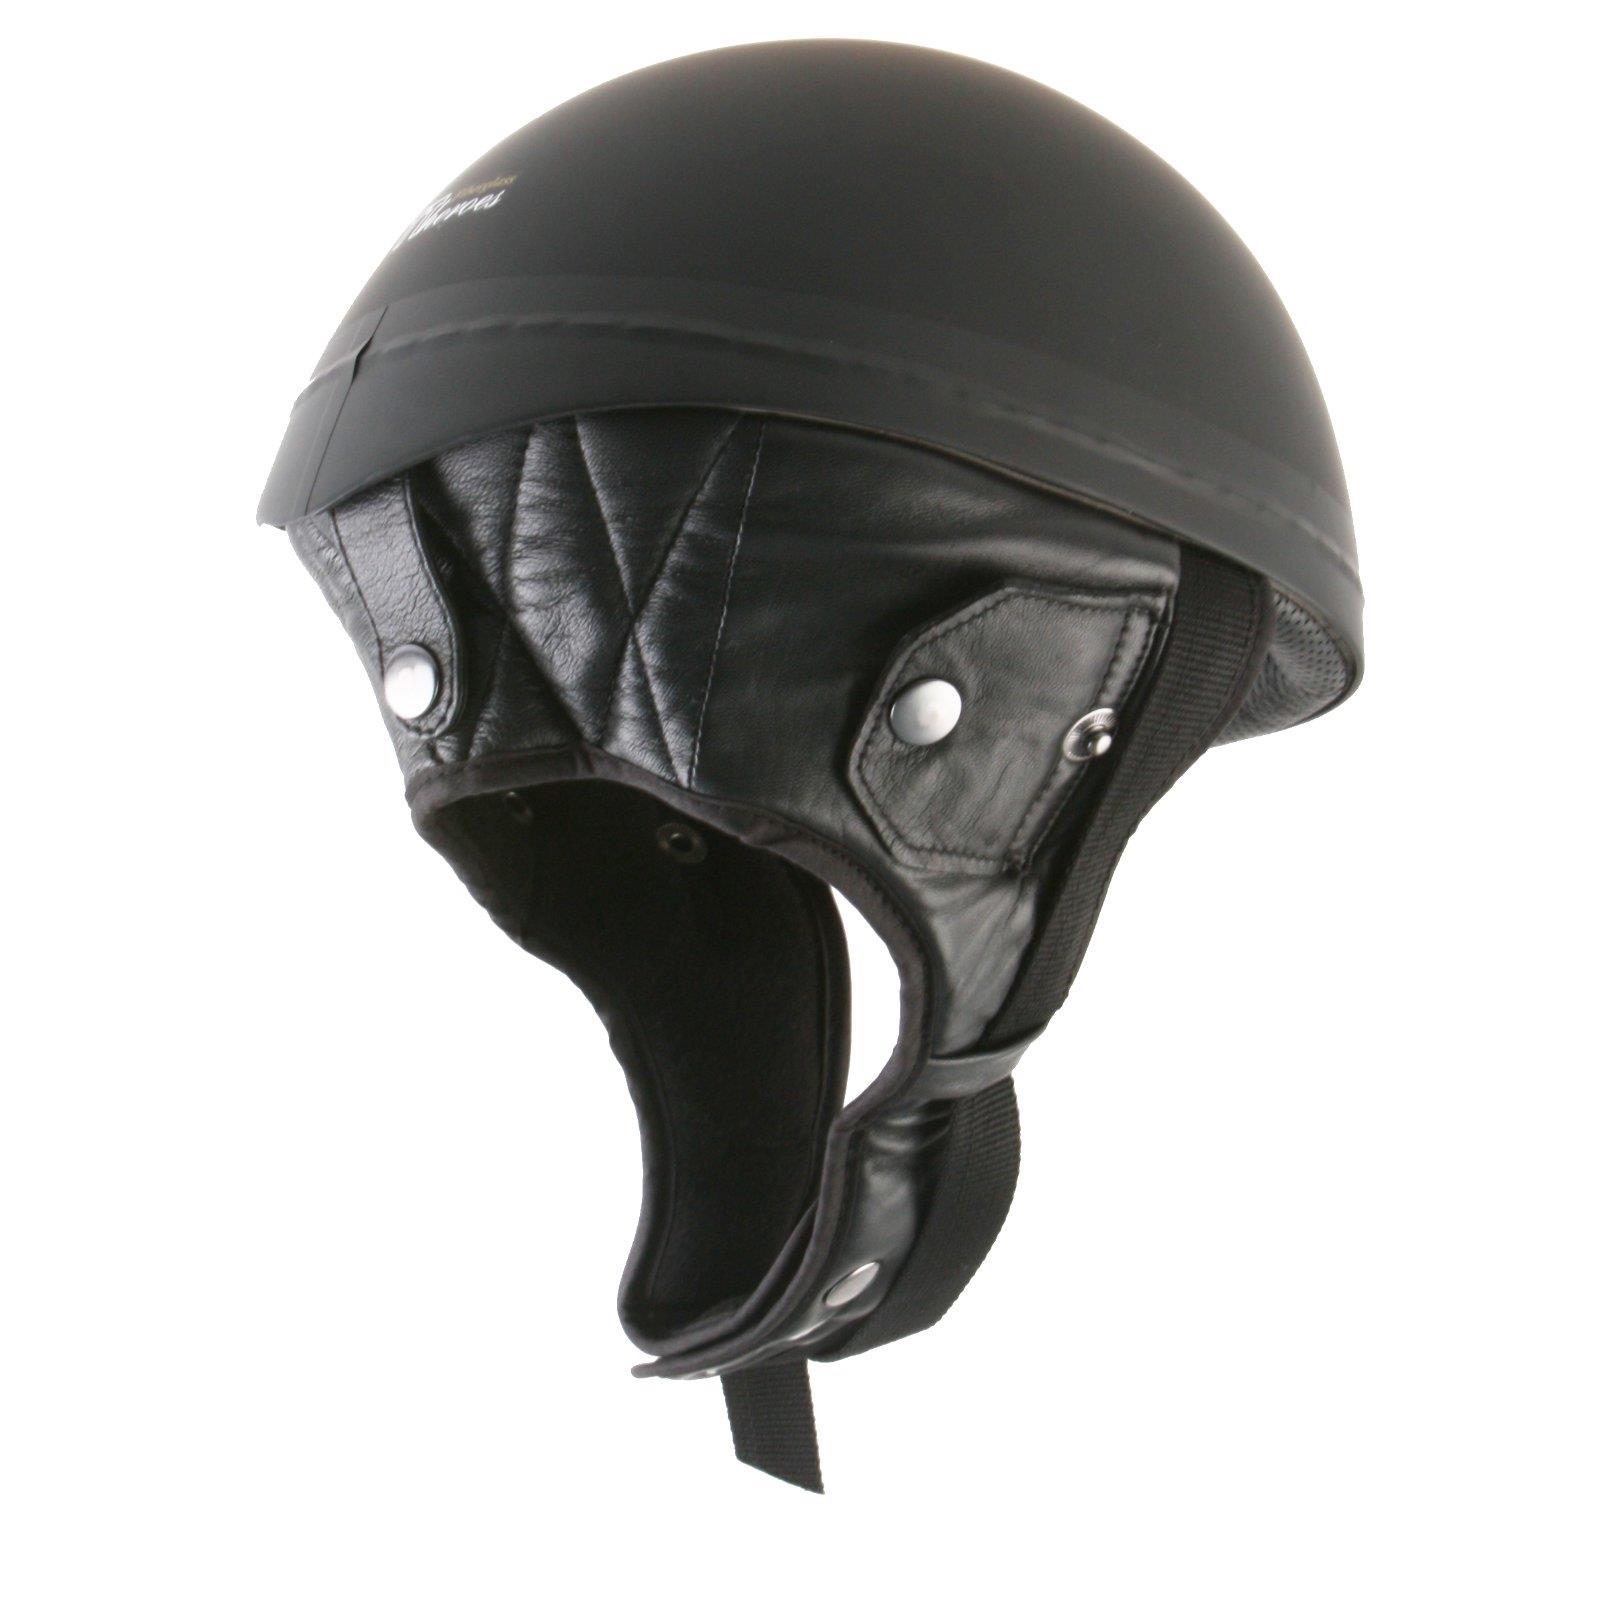 ttheroes kult braincap motorrad helm jethelm chopper. Black Bedroom Furniture Sets. Home Design Ideas